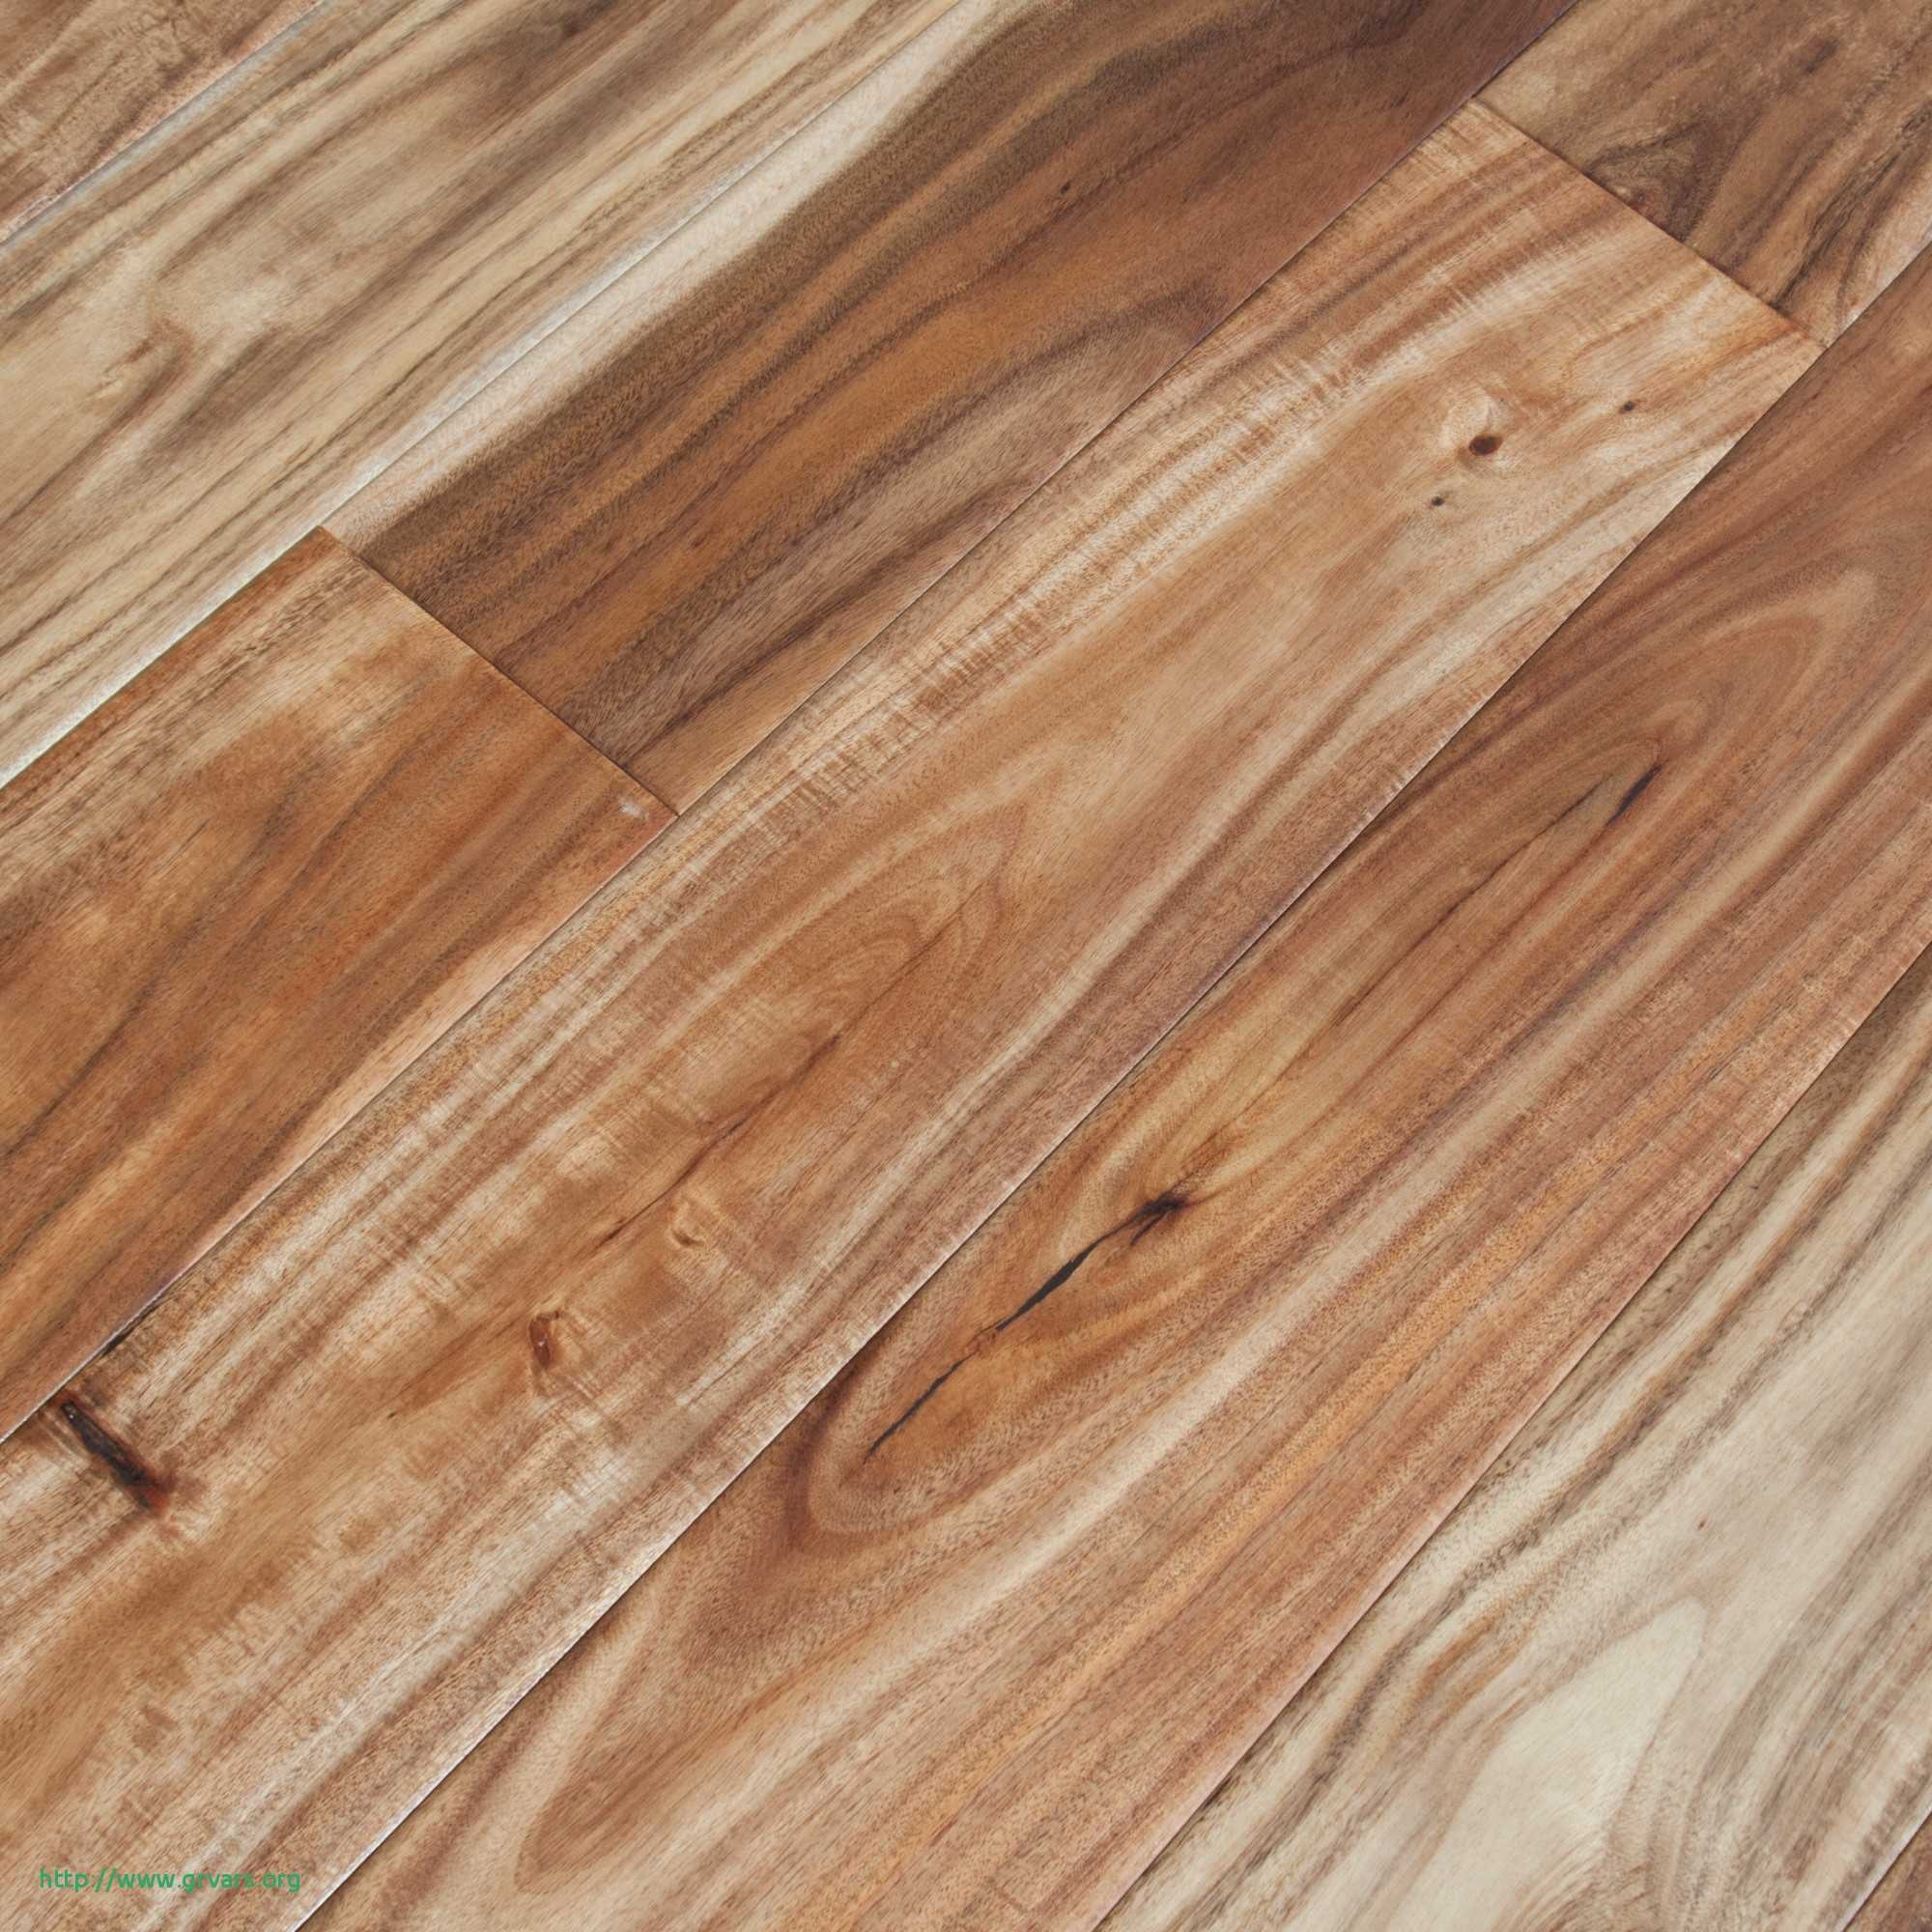 maple engineered hardwood flooring pros and cons of handscraped engineered hardwood awesome engineered wood flooring inside handscraped engineered hardwood elegant hardwood floor plank sizes frais why your engineered wood flooring images of